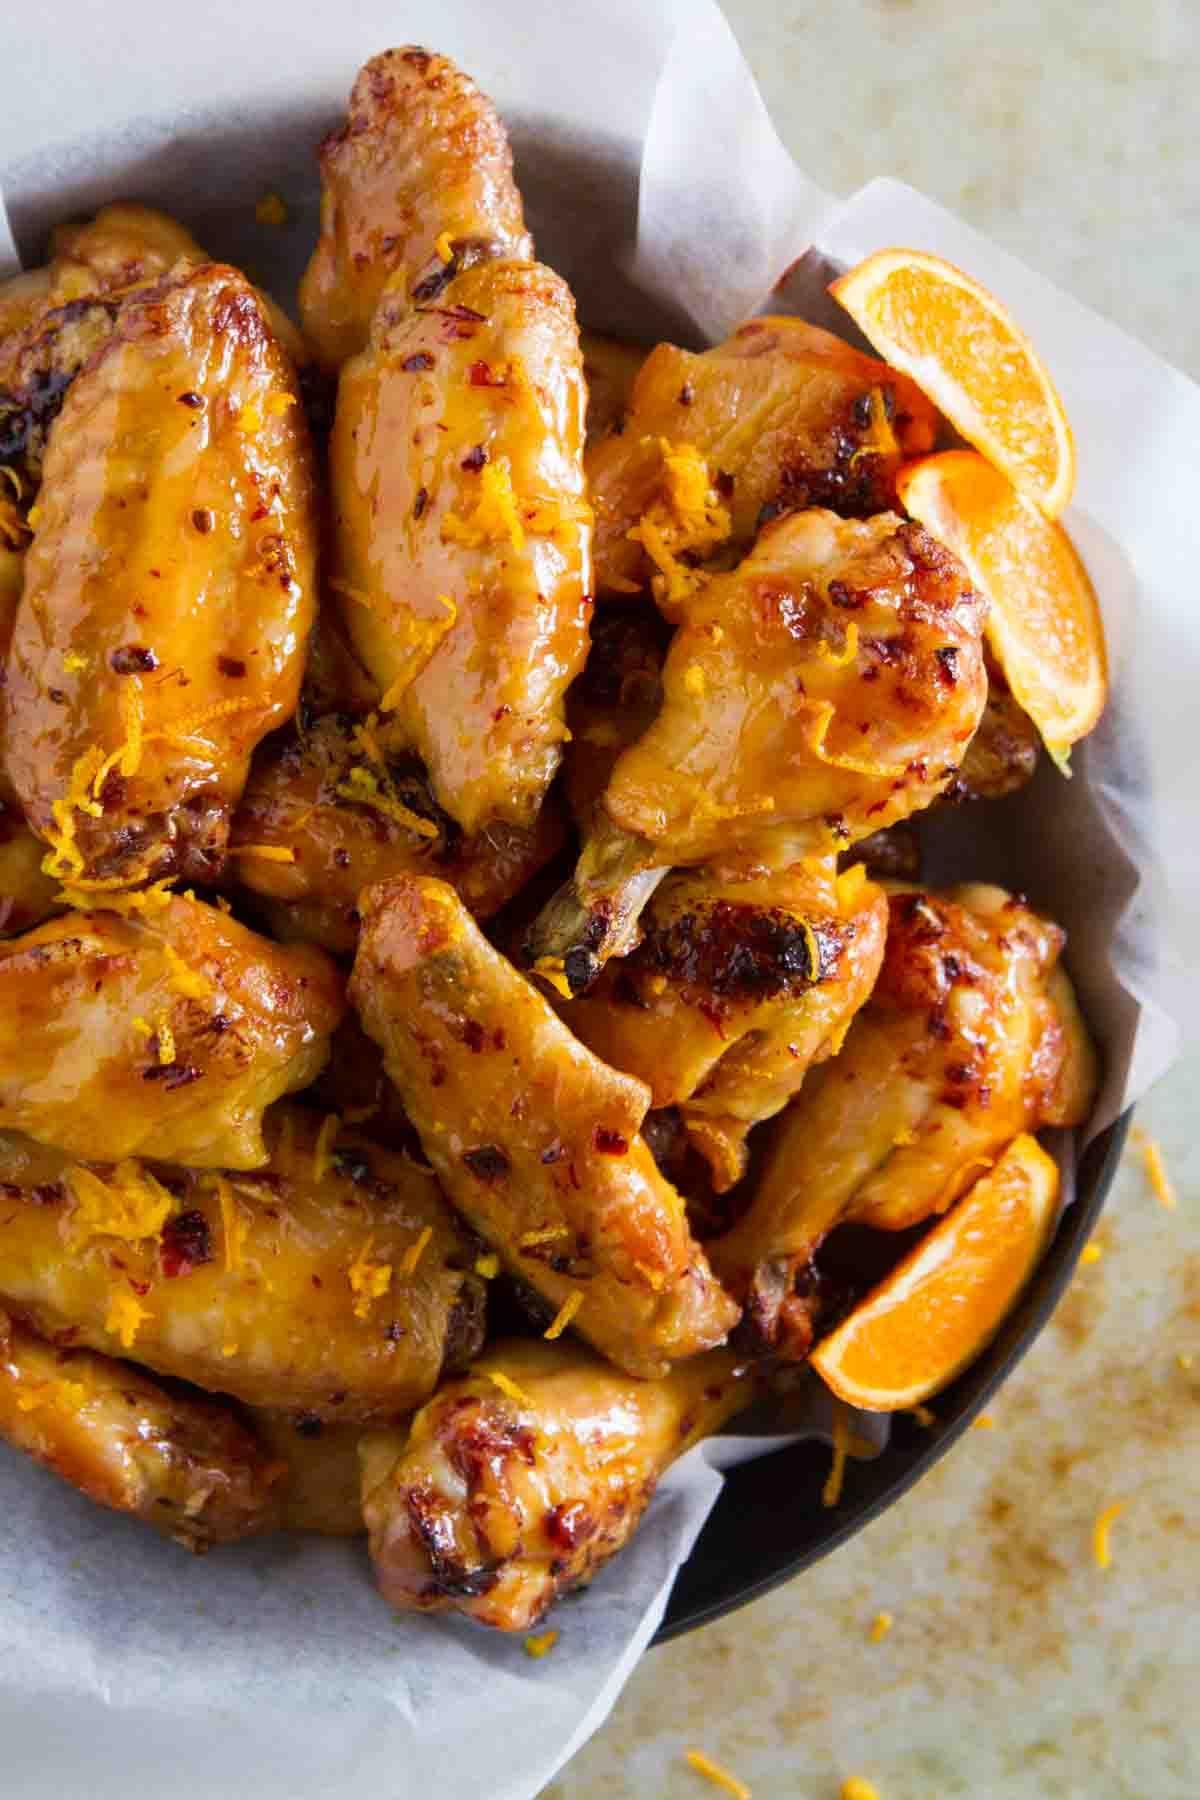 Chipotle Orange Chicken Wings Recipe Chicken wings